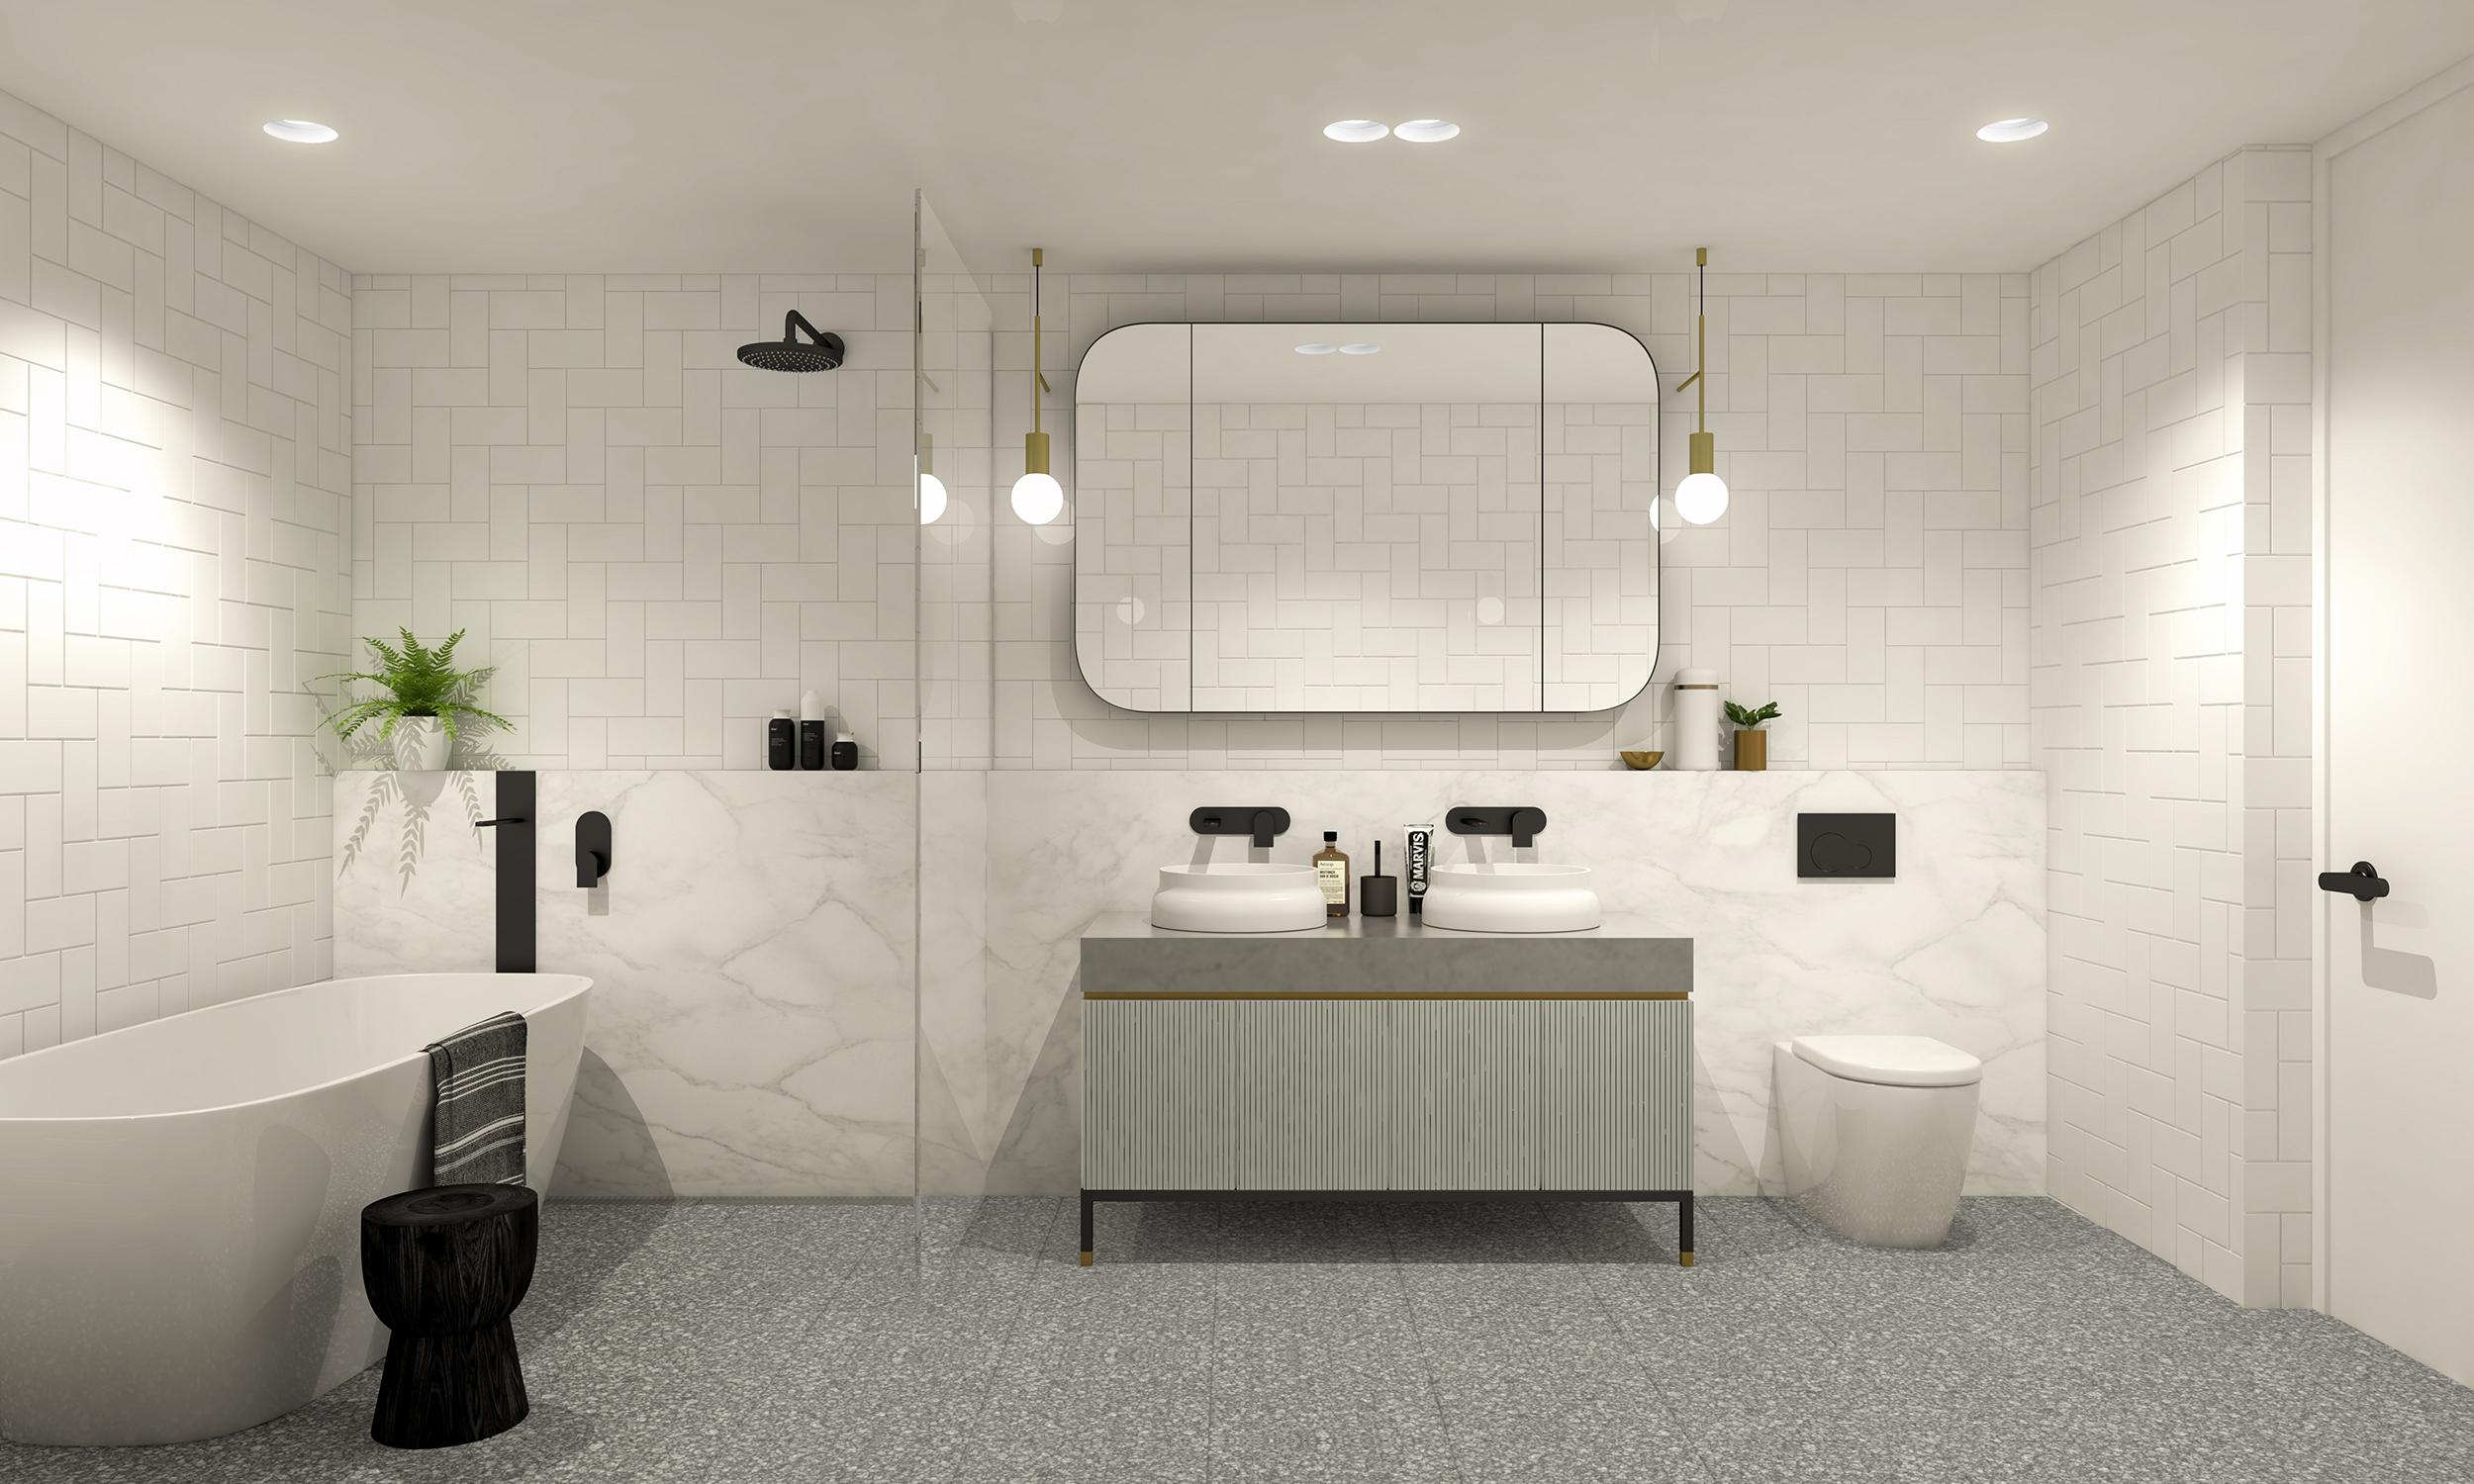 Well St - Apartment 1 - Bathroom - Light Scheme MR.jpg